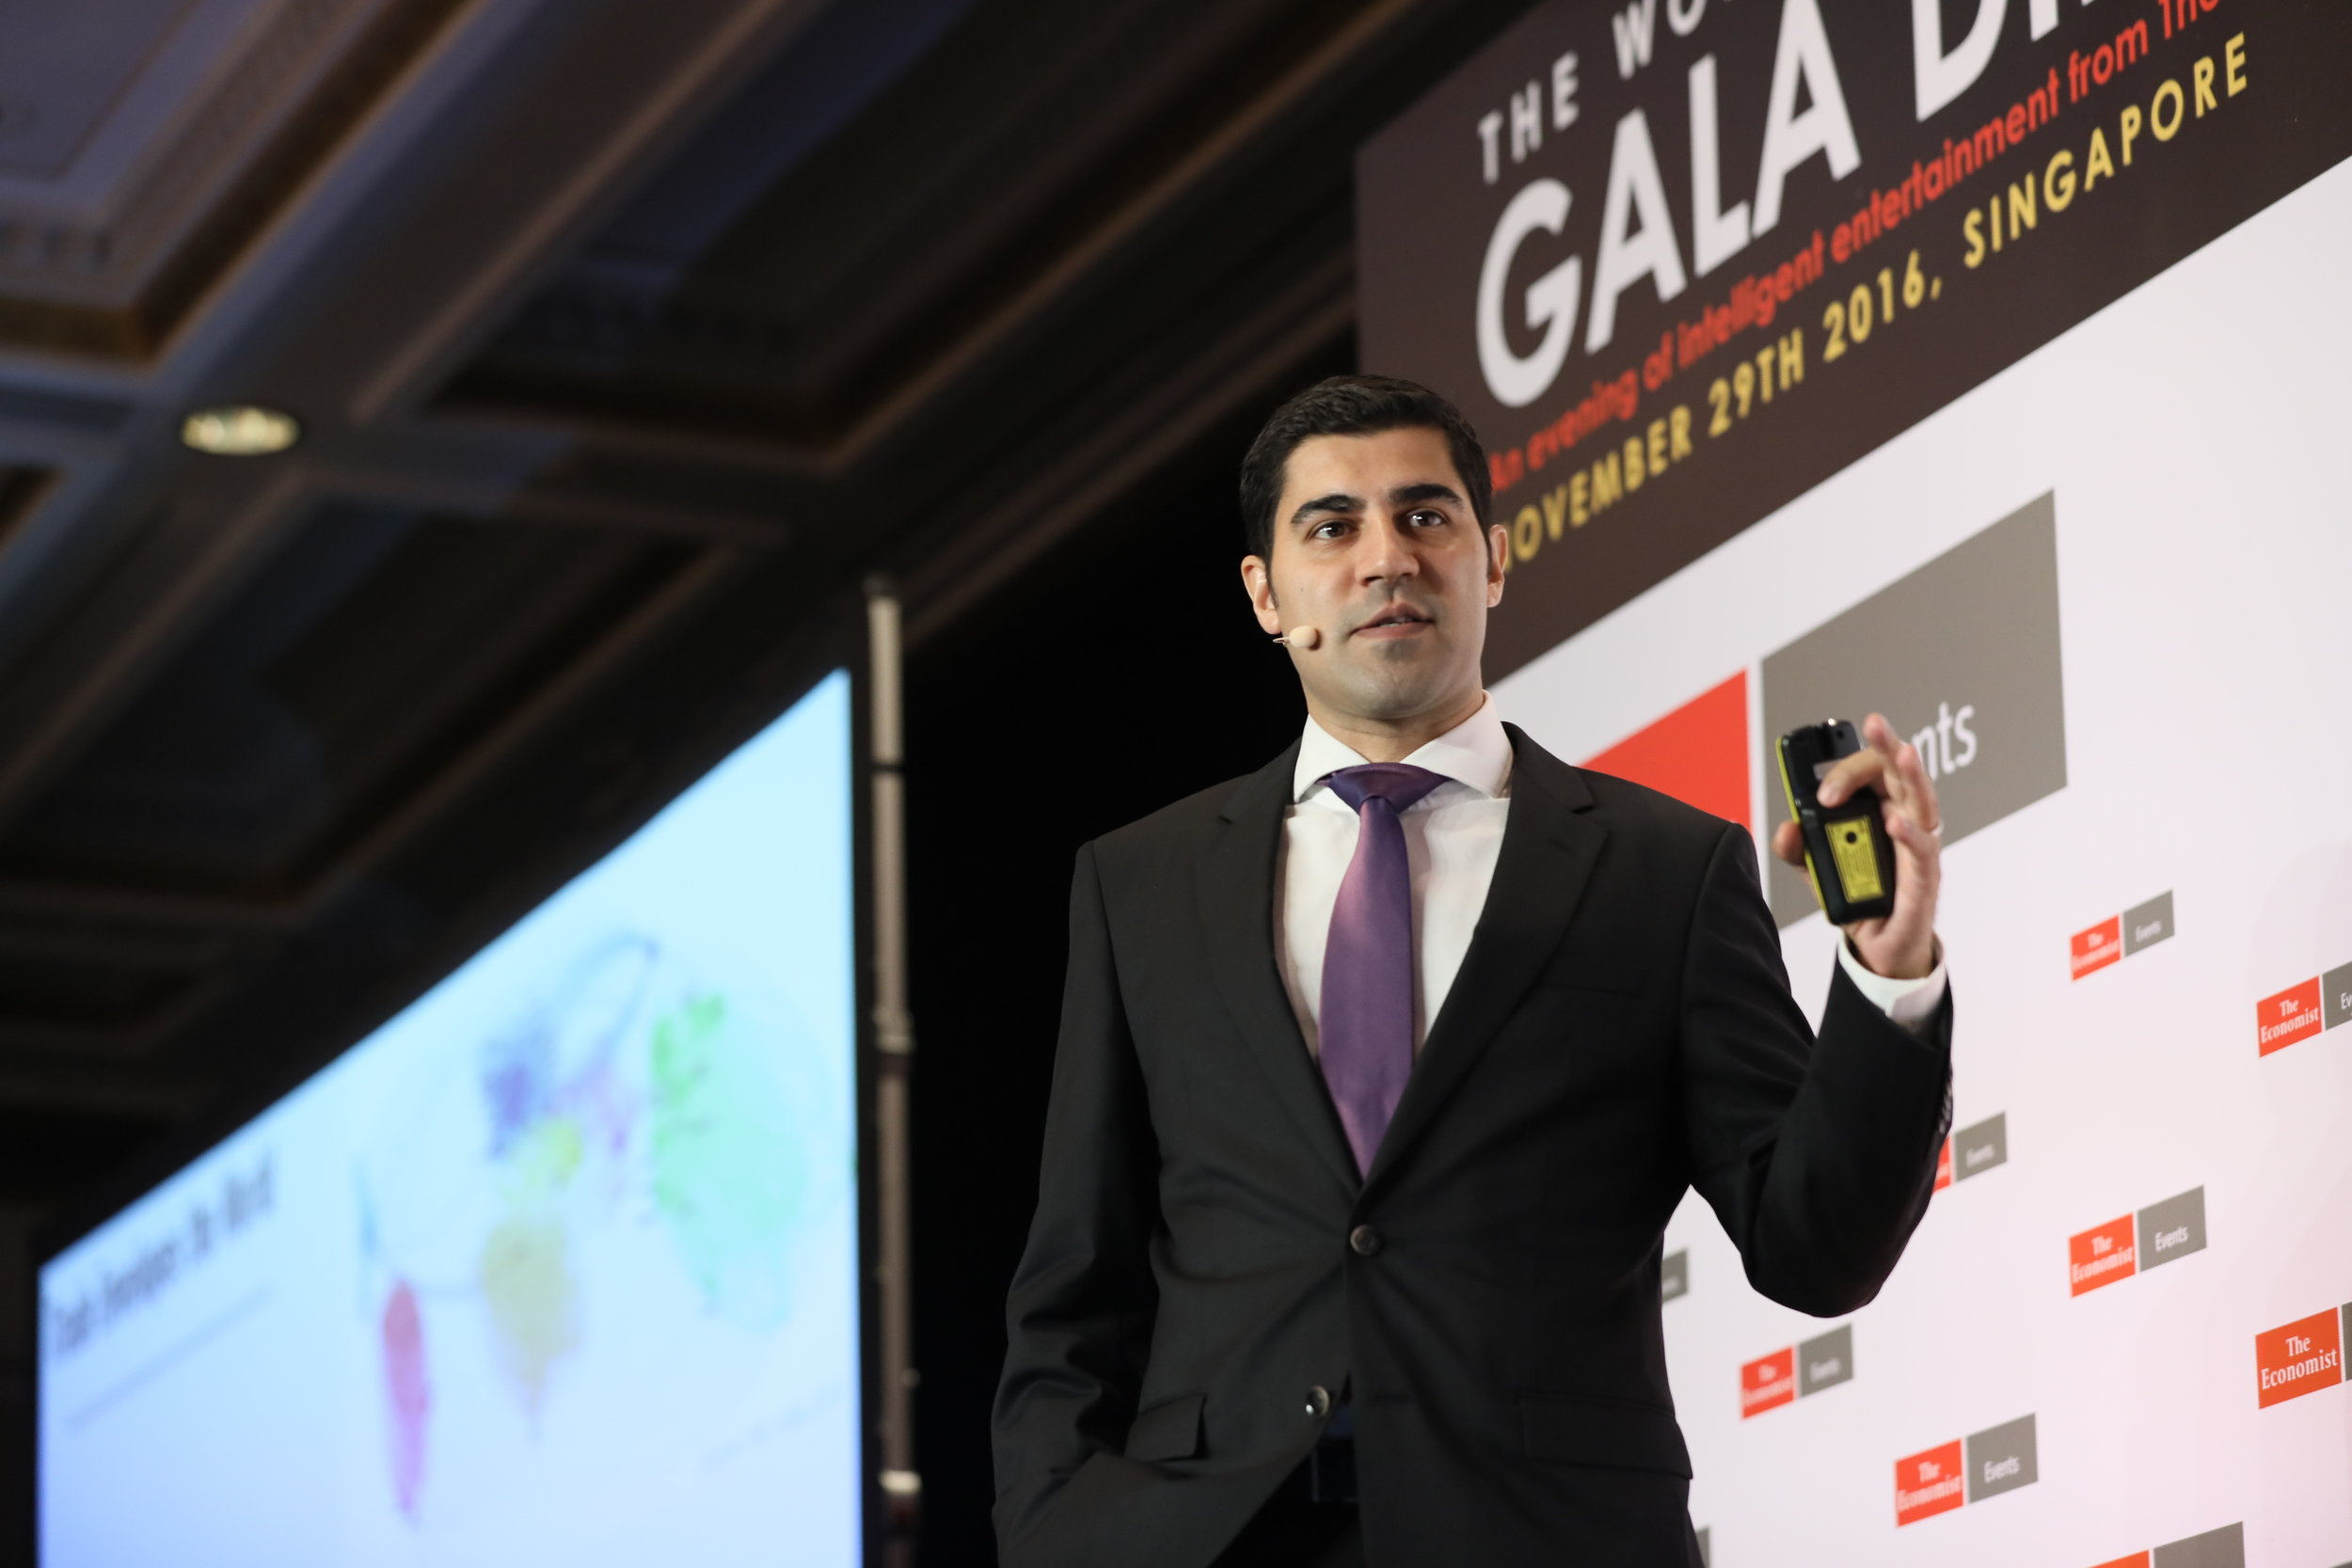 Parag Khanna Author Keynote Speaker at Economist Gala 2016